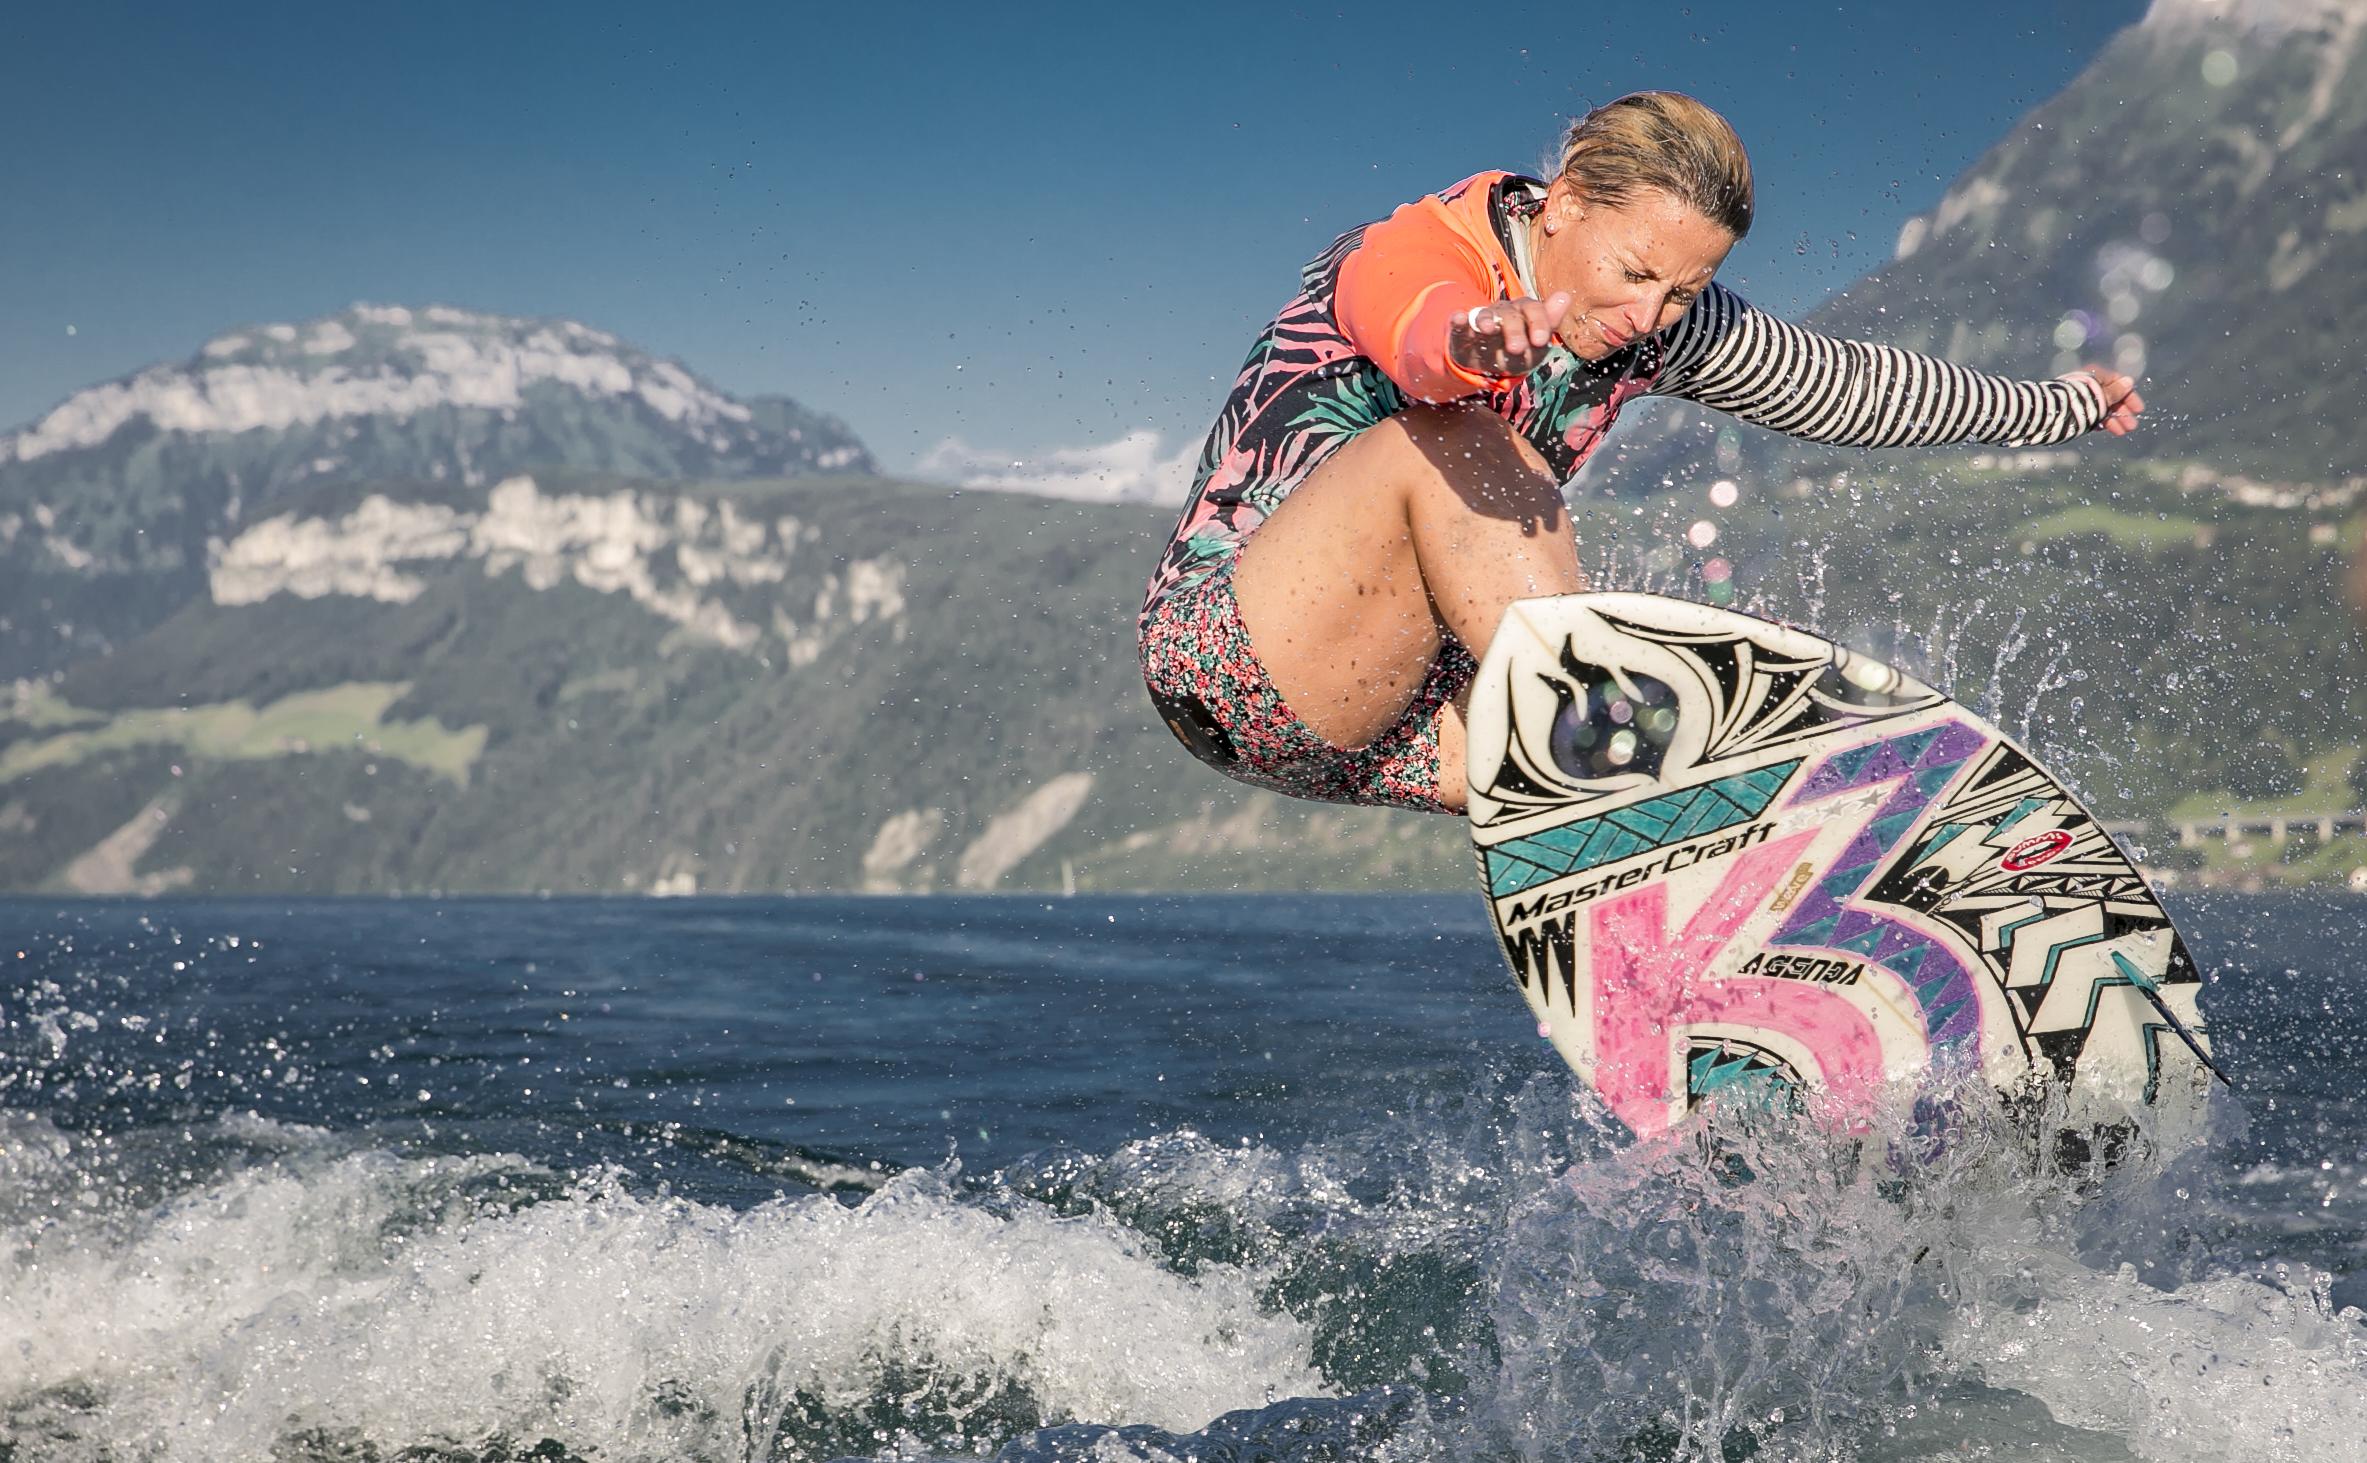 Korina Smyrek- Pro Wakesurfer from Switzerland